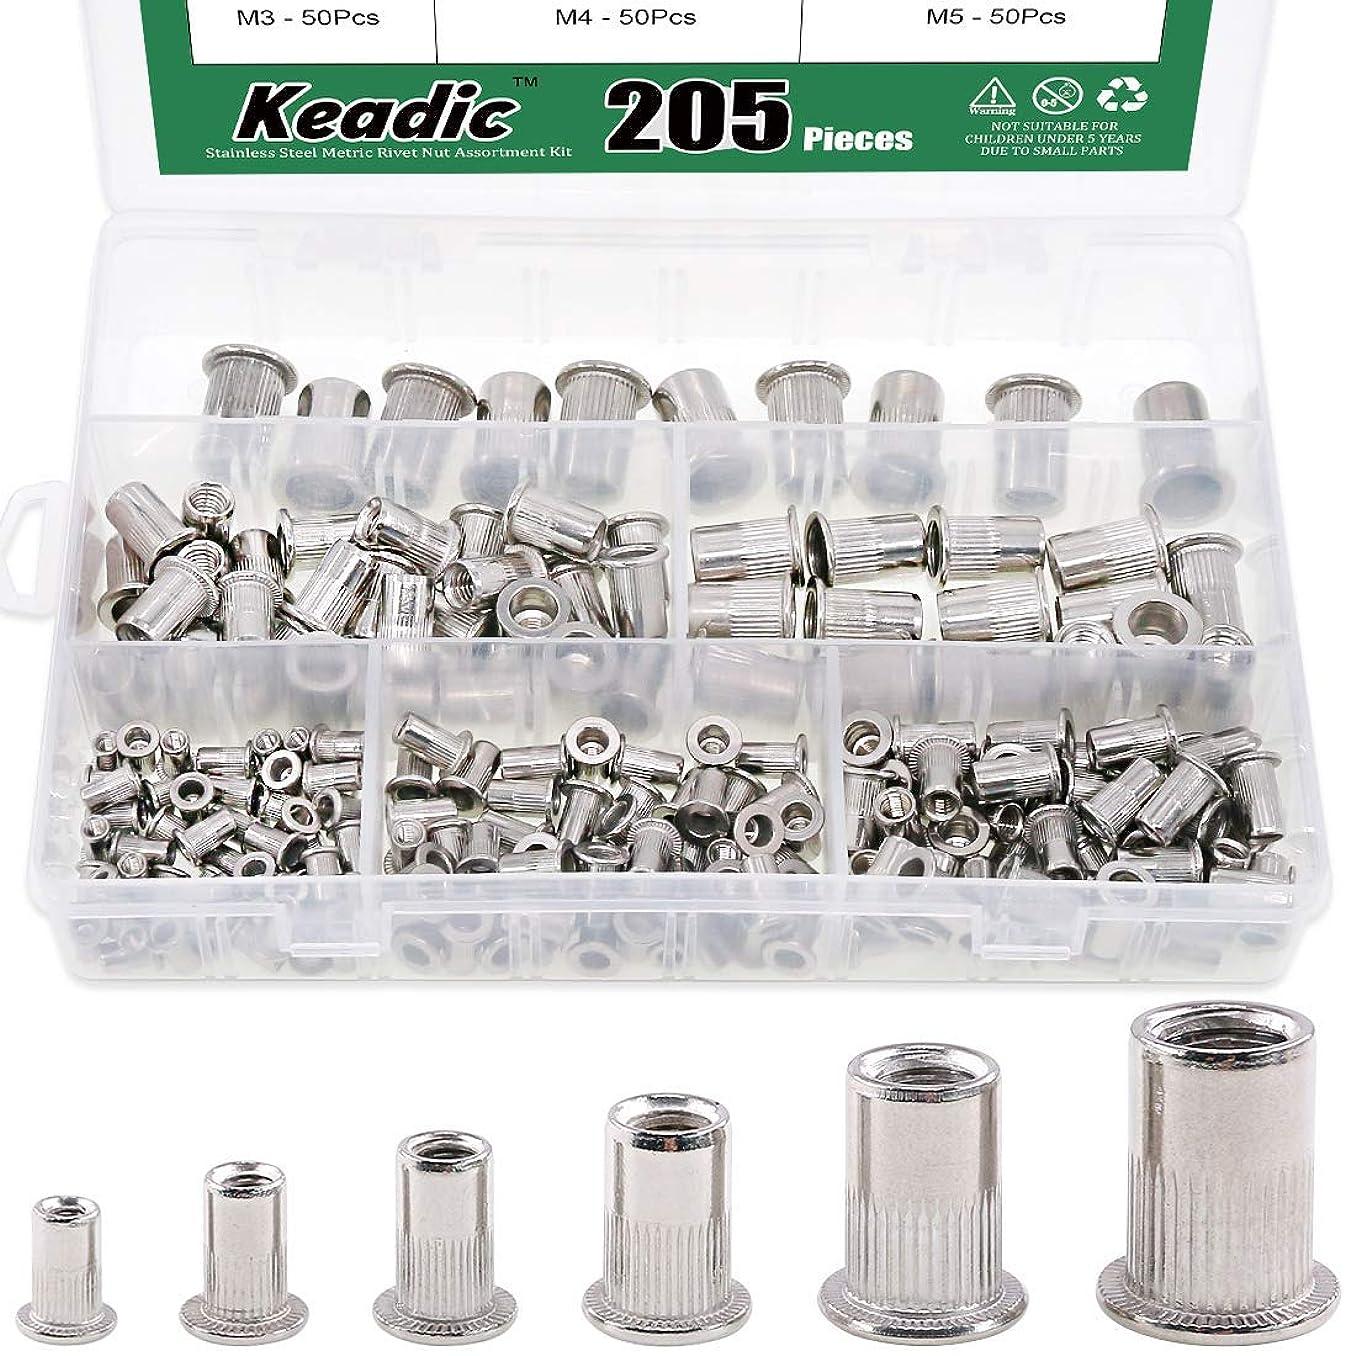 Keadic 205Pcs 304 Stainless Steel Metric Rivet Nut Flat Head Threaded Insert Nutsert Assortment Kit - M3 M4 M5 M6 M8 M10